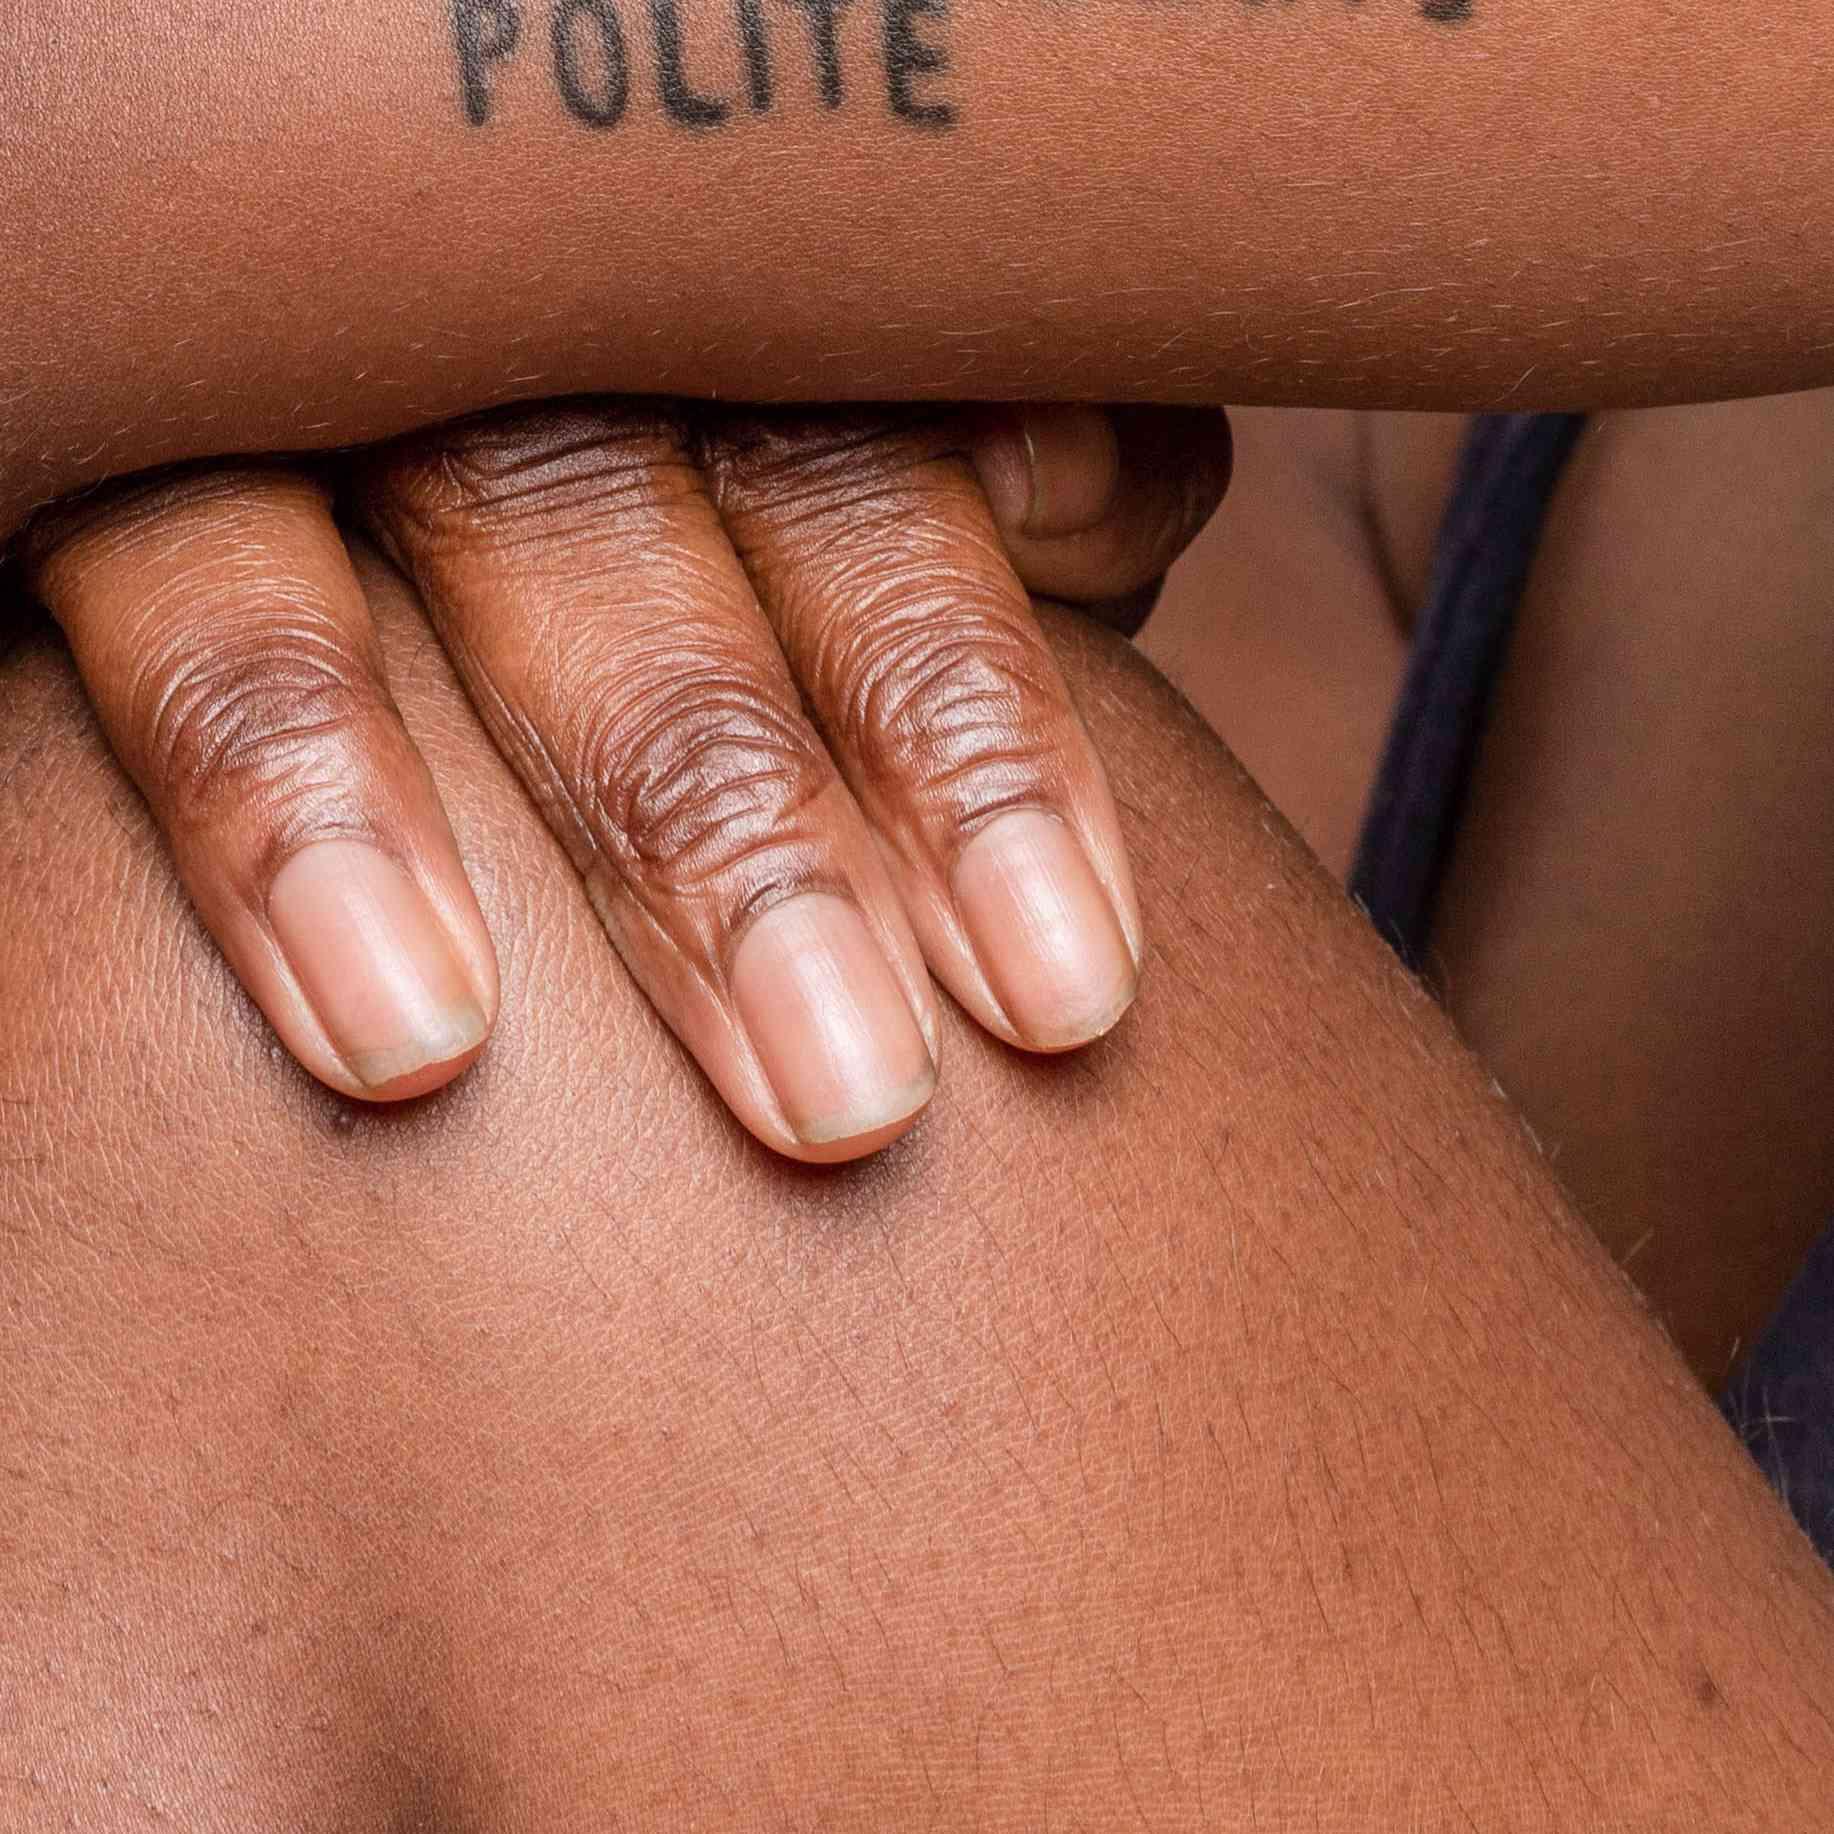 word tattoo on forearm